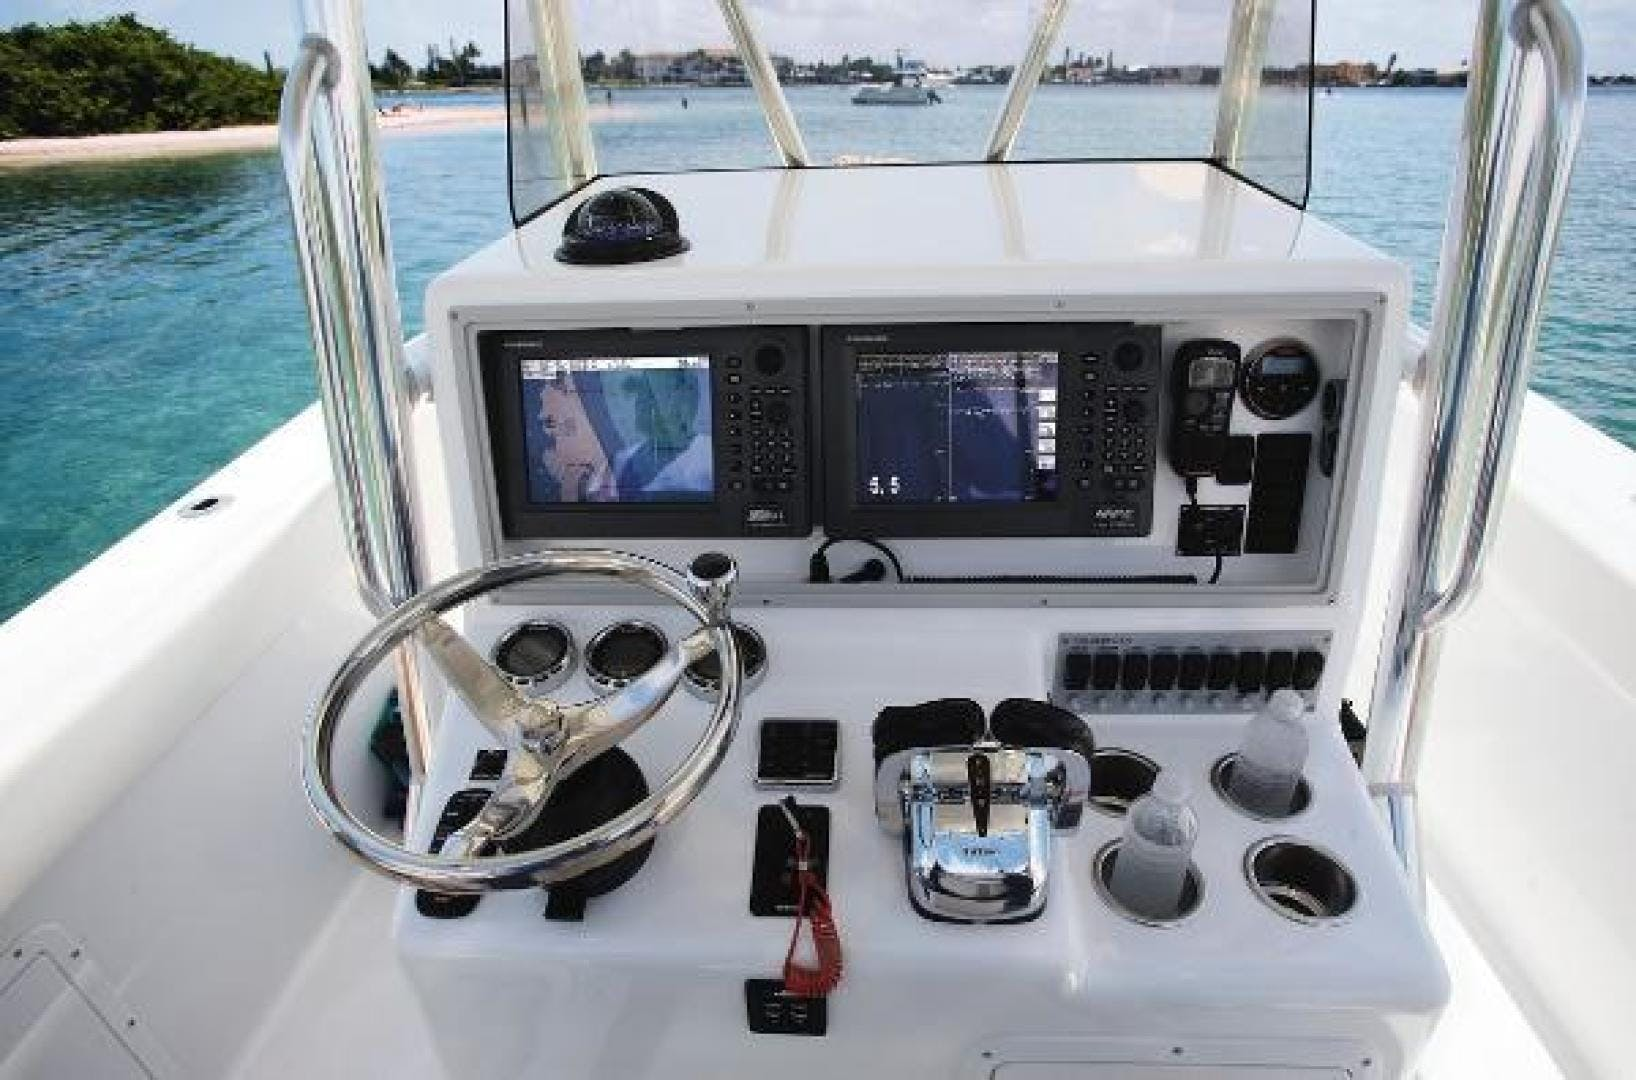 2021 Bluewater Sportfishing 27' 2850 Bluewater Sportfishing 2850   Picture 7 of 16